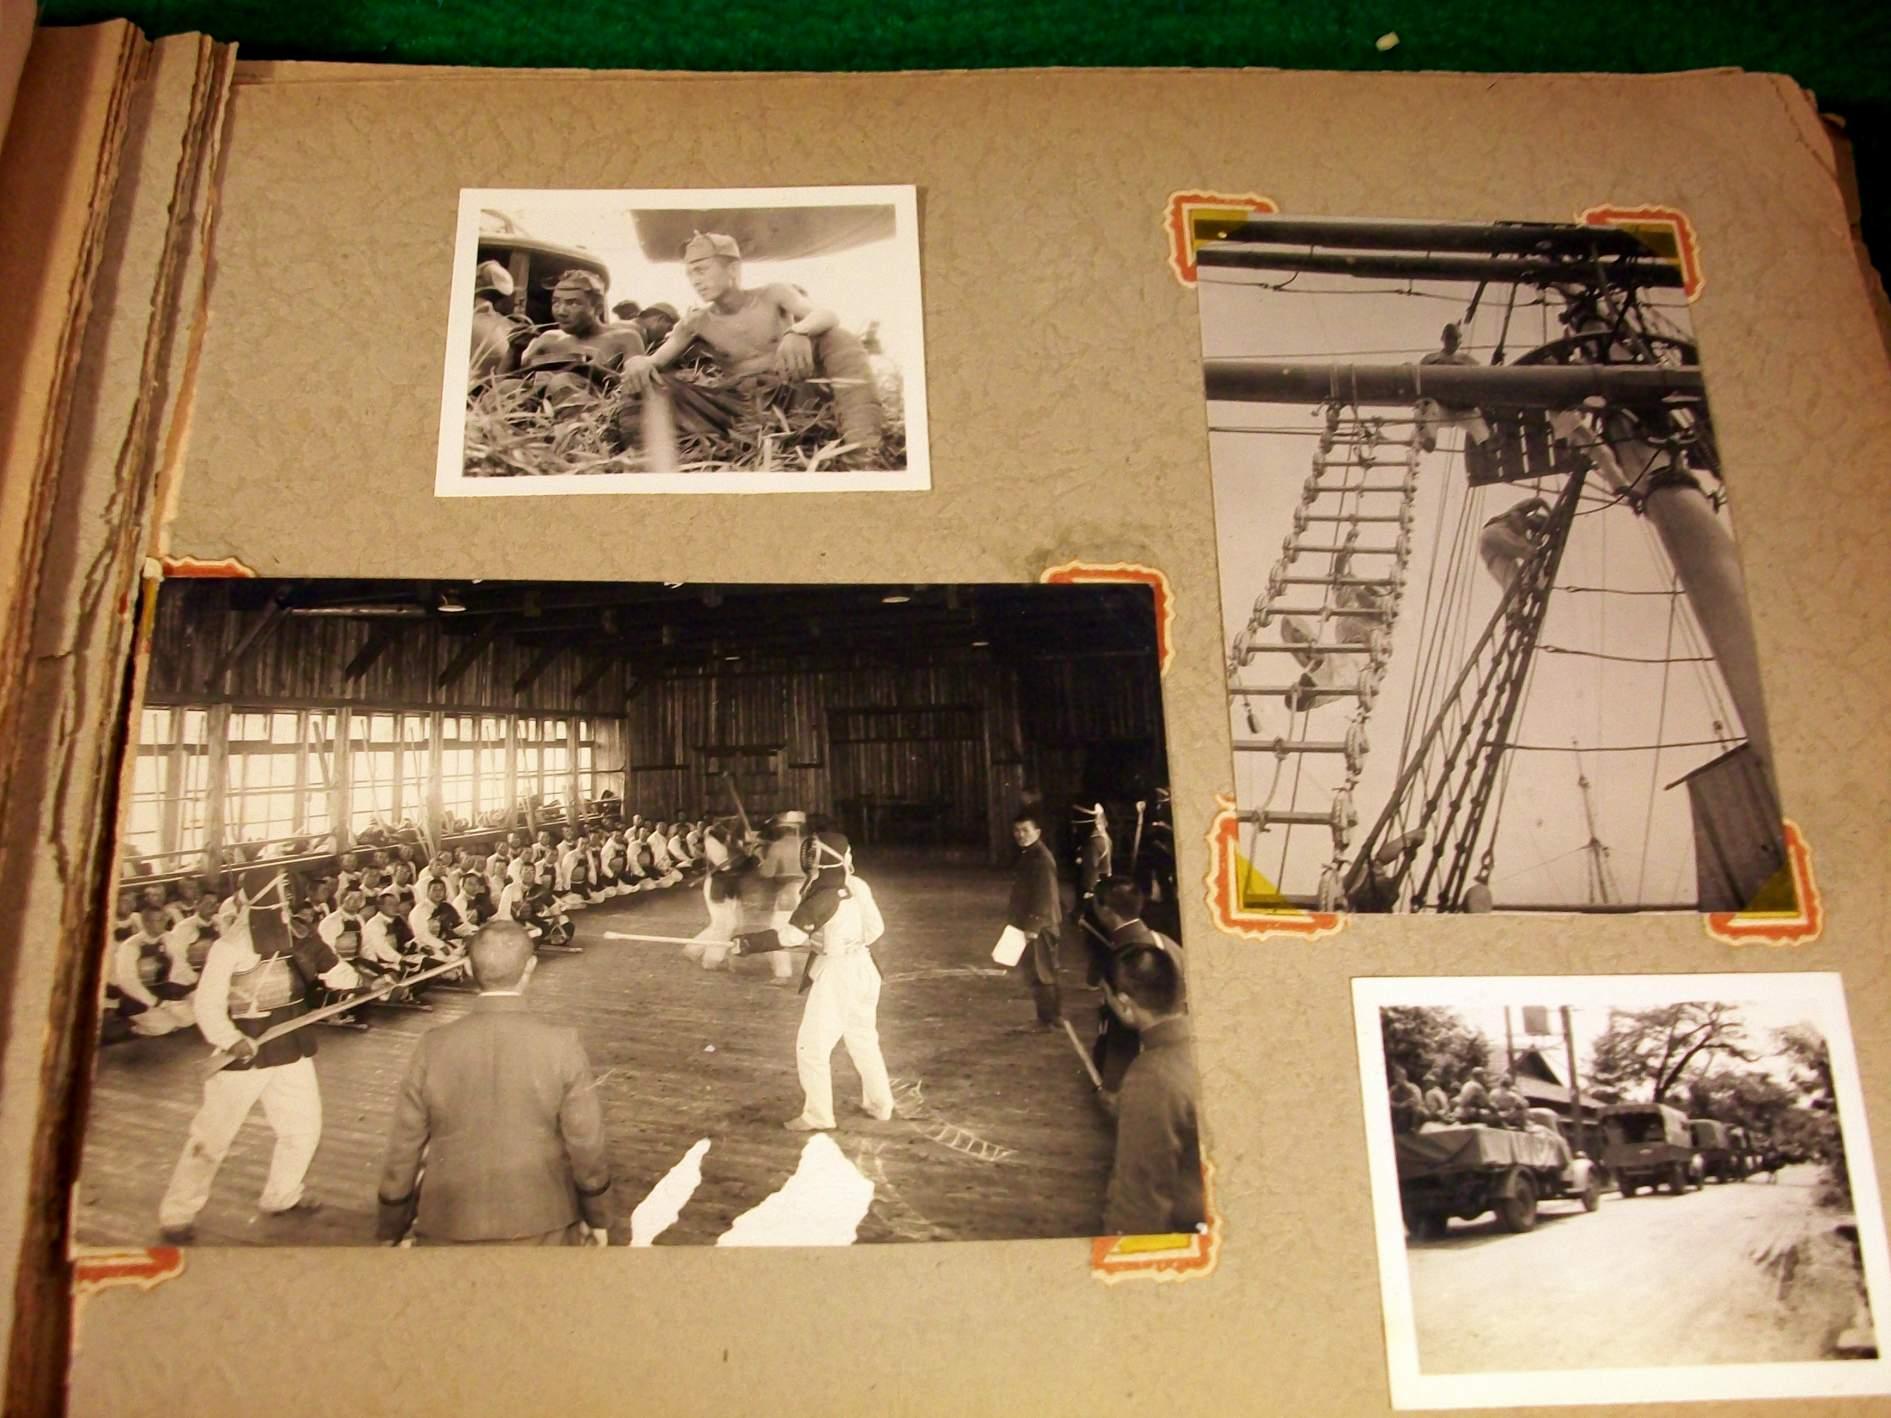 ww2 japanese soldier photo album  anyone read japanese